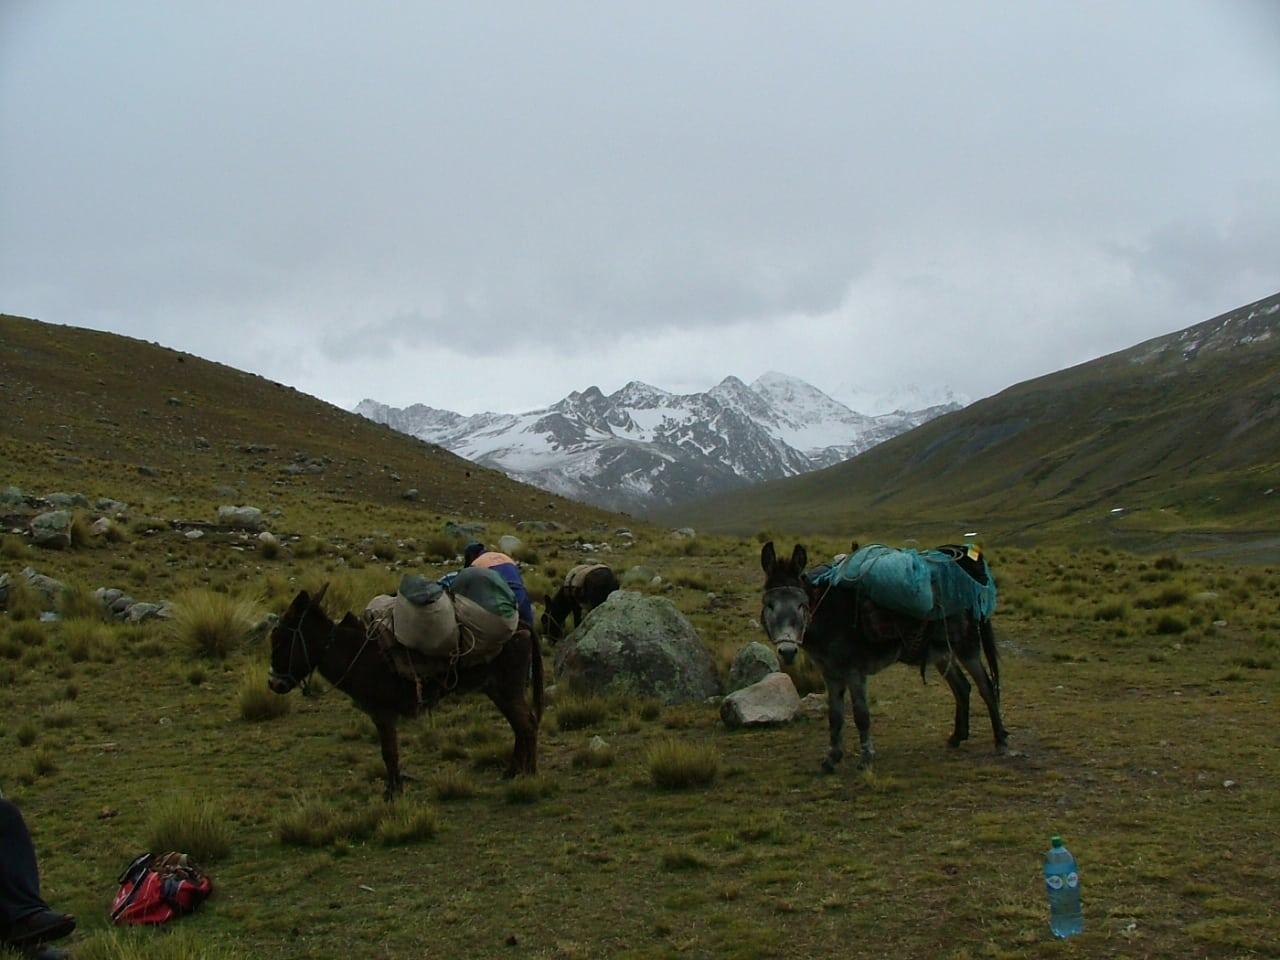 Condoriri – Huayna Potosí 8-day hike